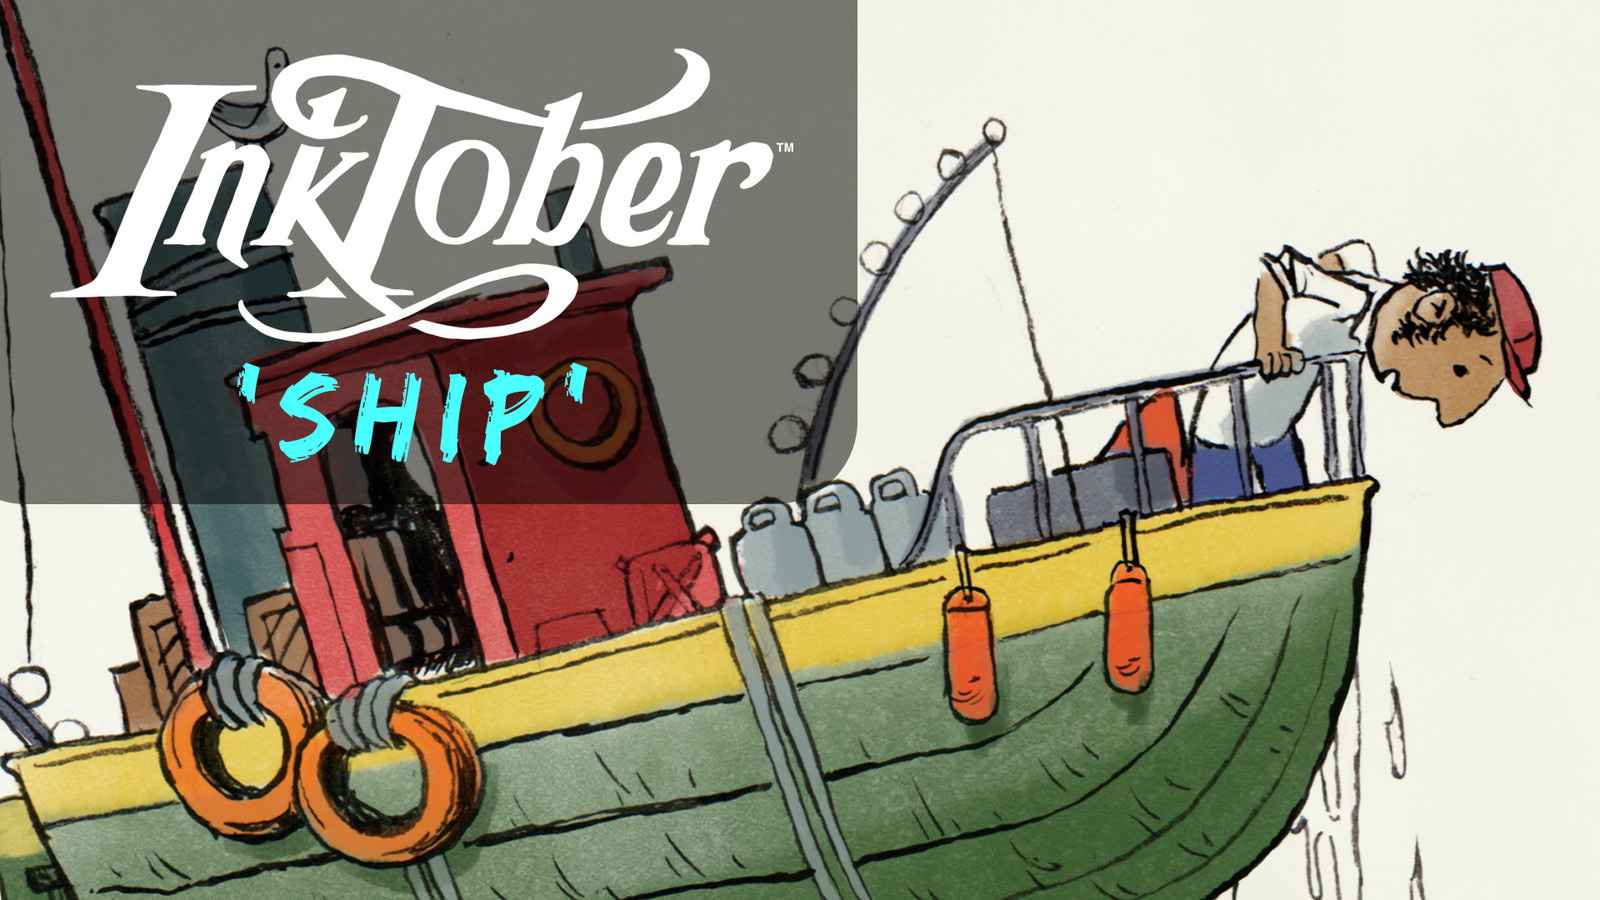 Inktober 2017 #25 Ship